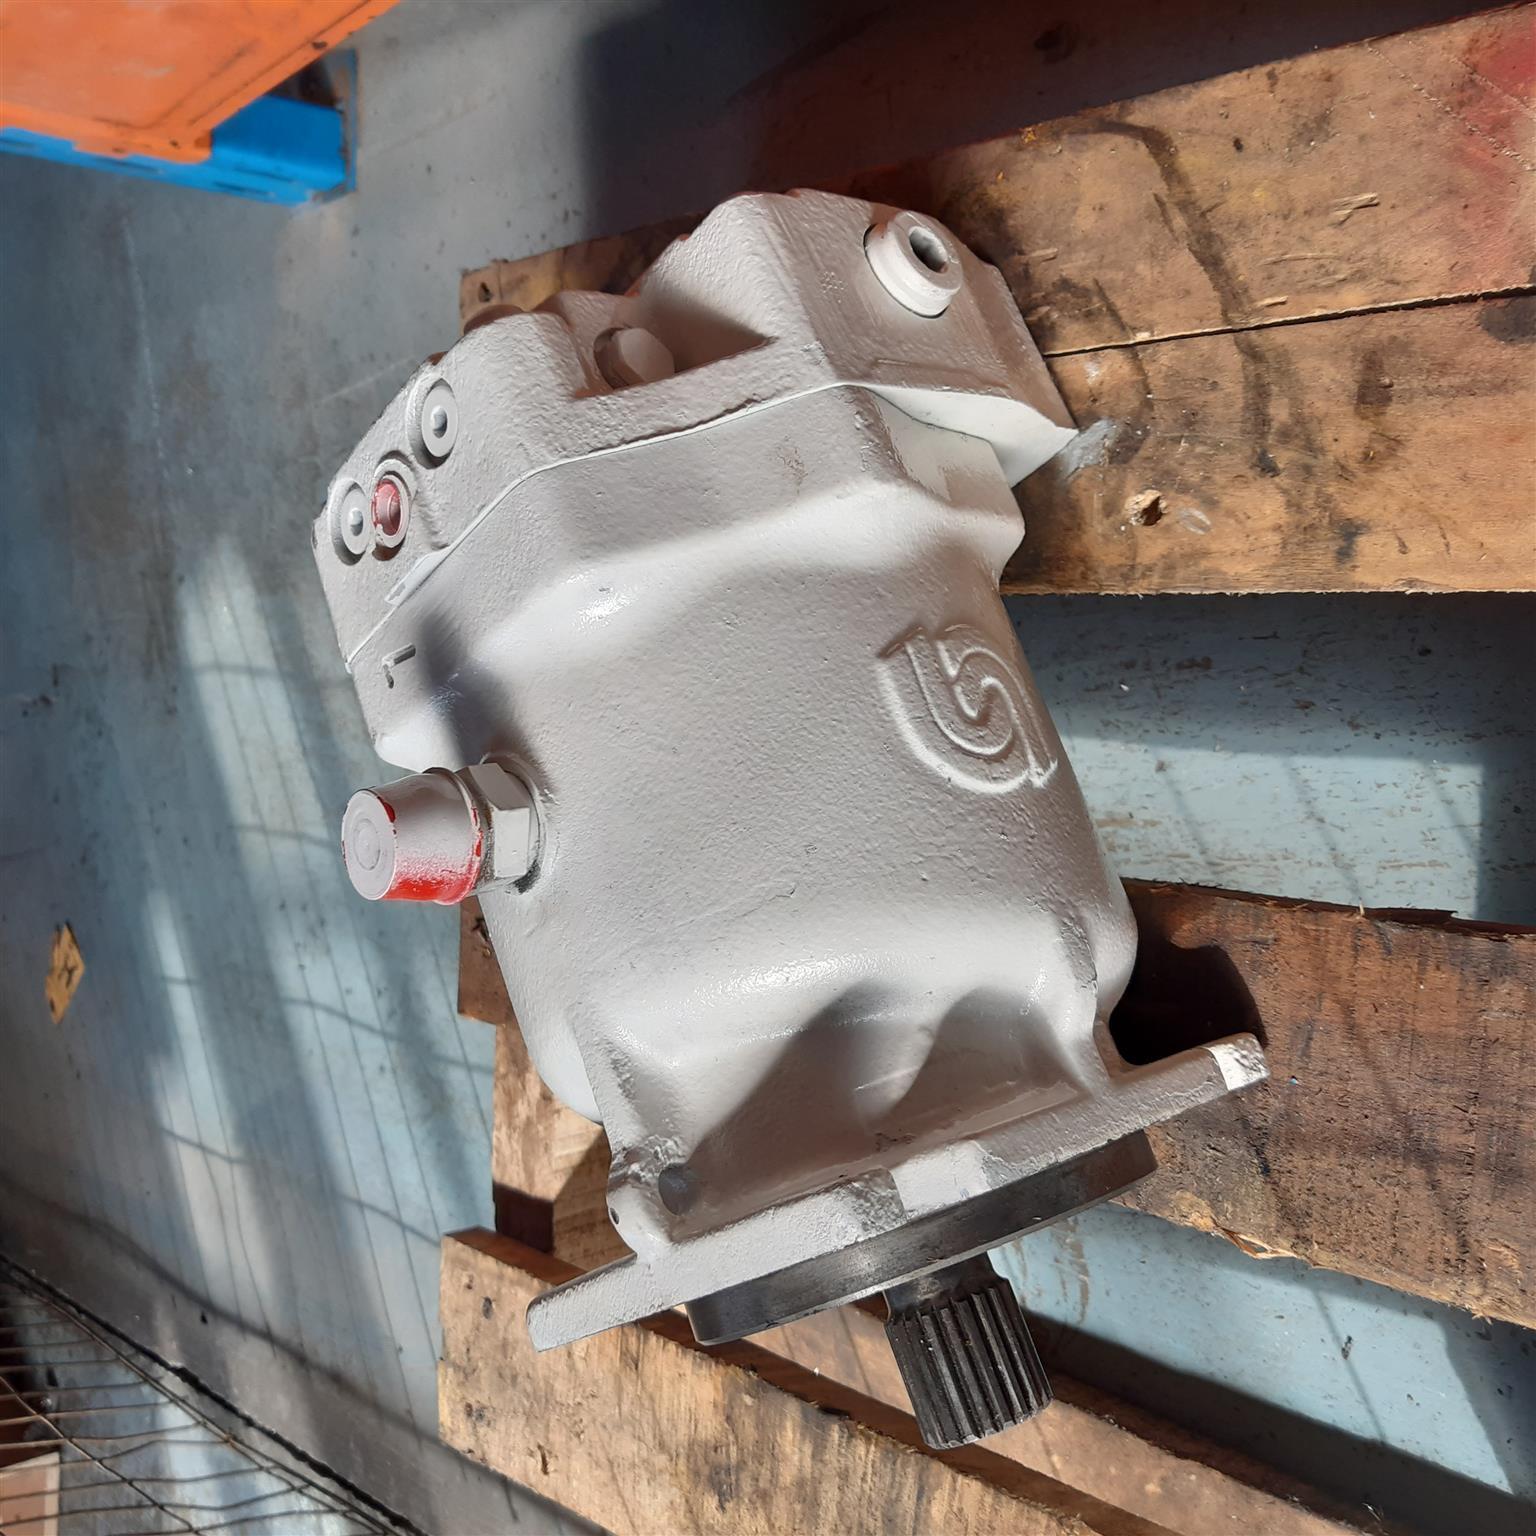 Sauer-Danfoss 70cc Series 90 hydraulic motor for concrete mixer truck drum drive and wheel drives.